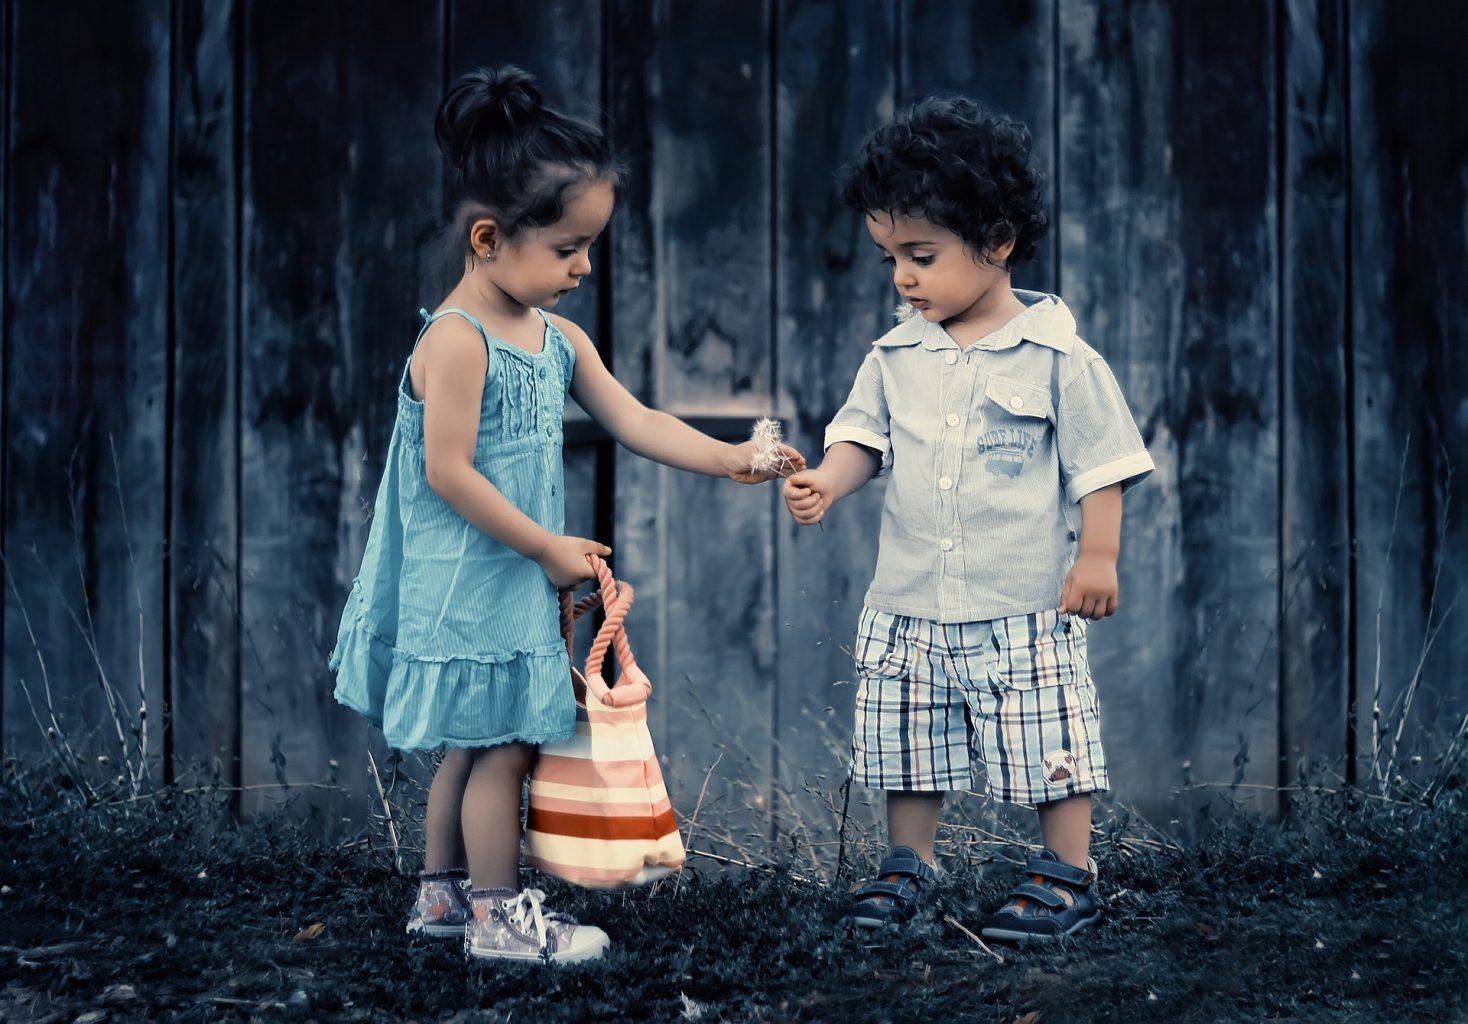 Image: Children